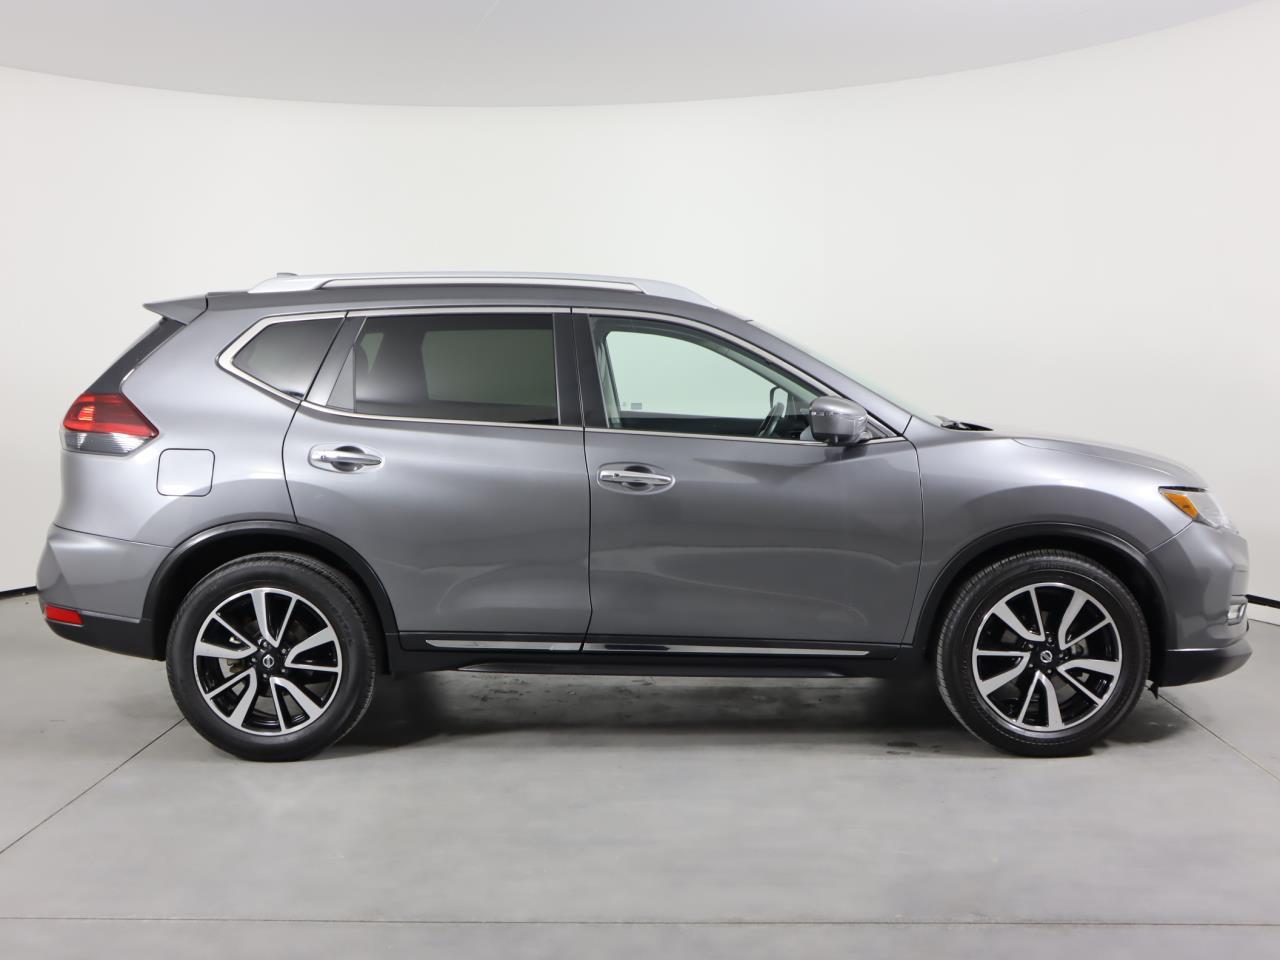 used vehicle - SUV NISSAN ROGUE 2019